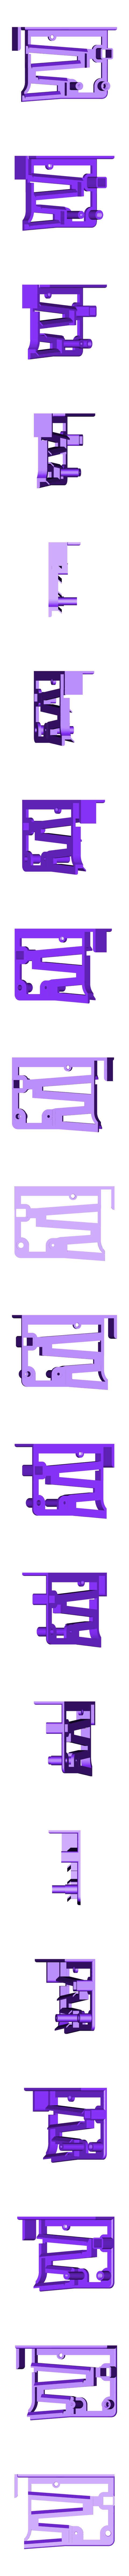 Base_2a.stl Download free STL file Marblevator, Mechanisms • Object to 3D print, gzumwalt